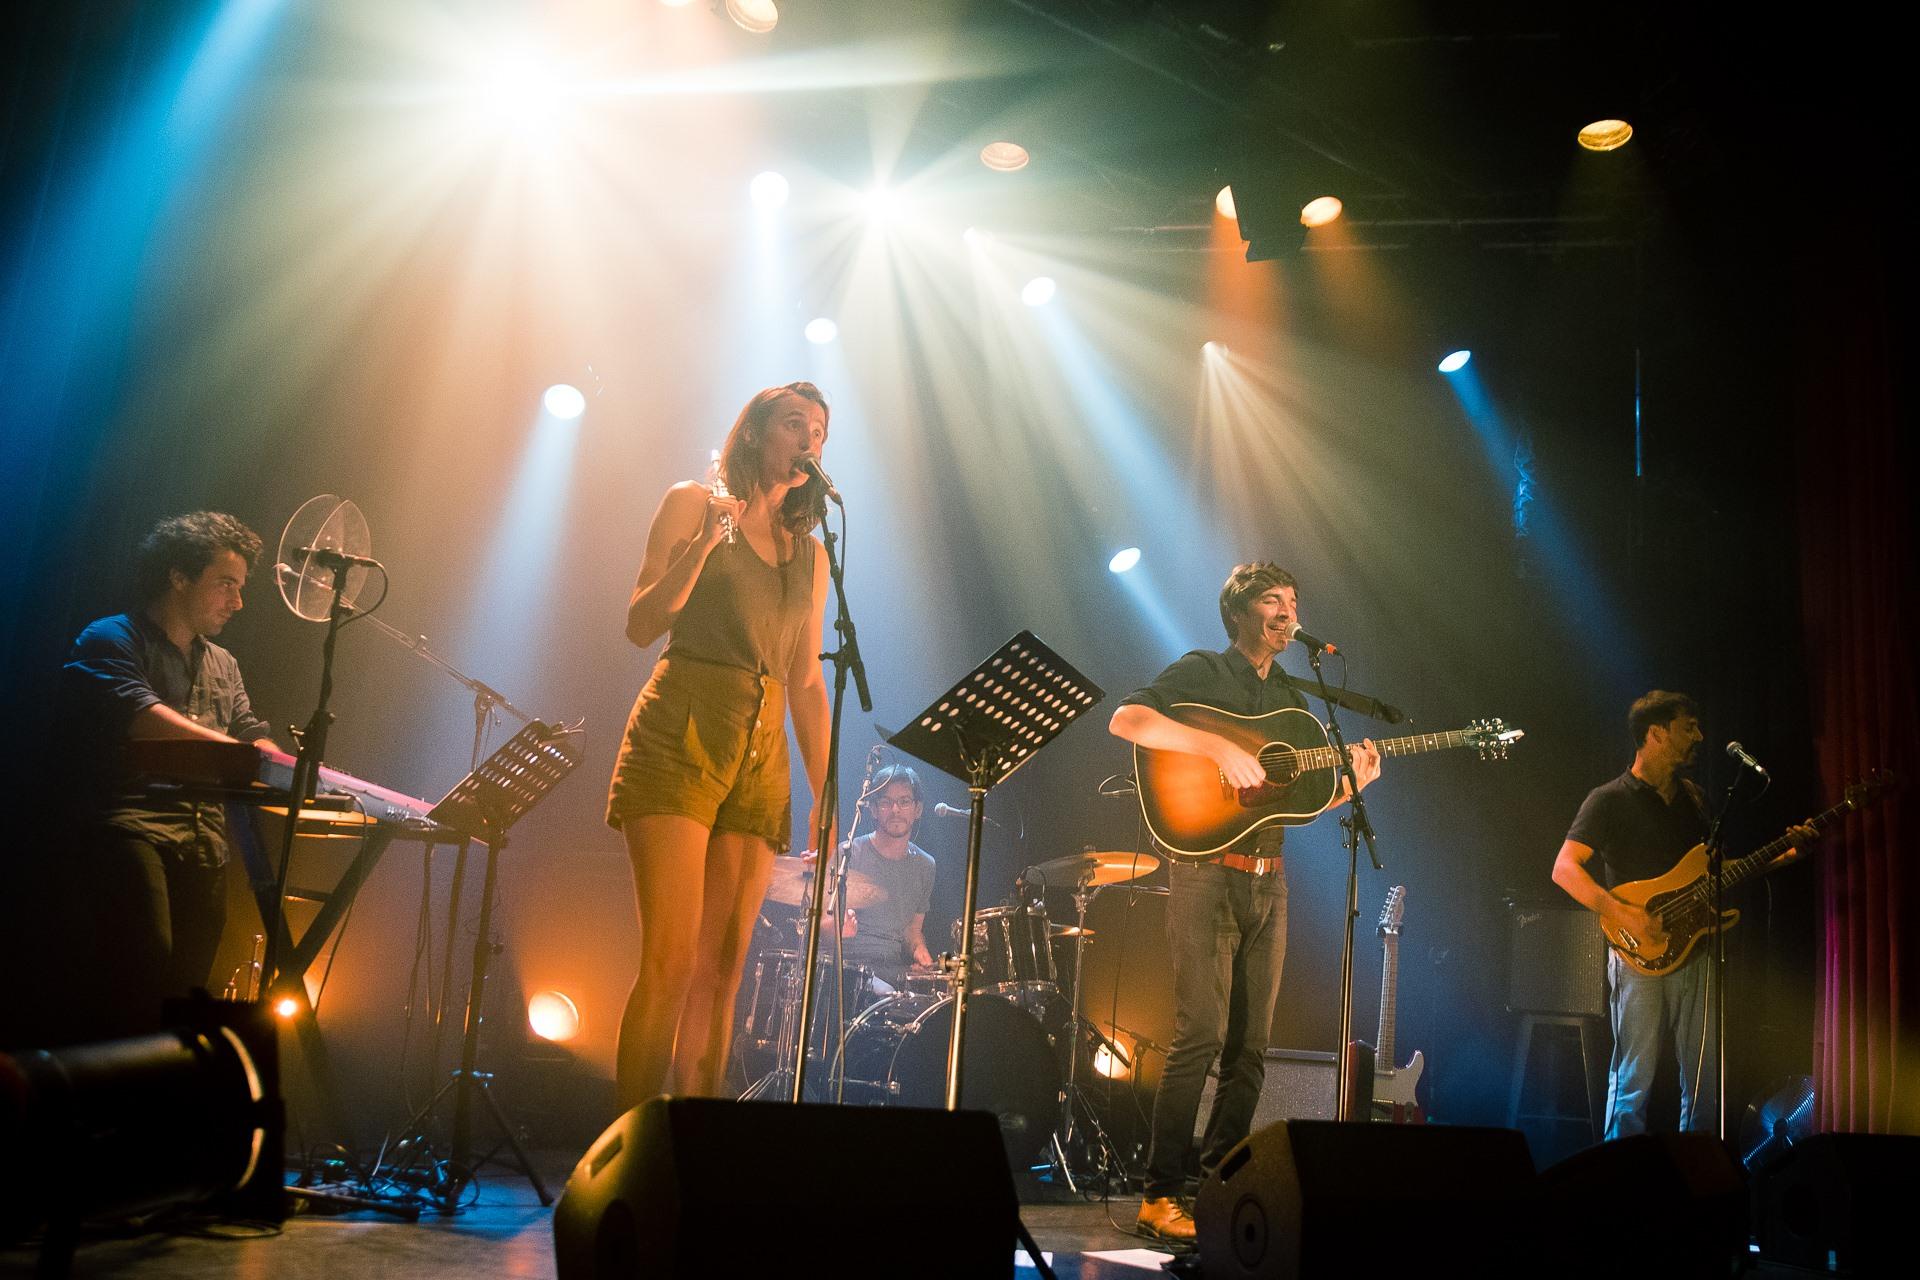 Orouni - Les Trois Baudets - 11.09.2018 - Mickaël Adamadorassy